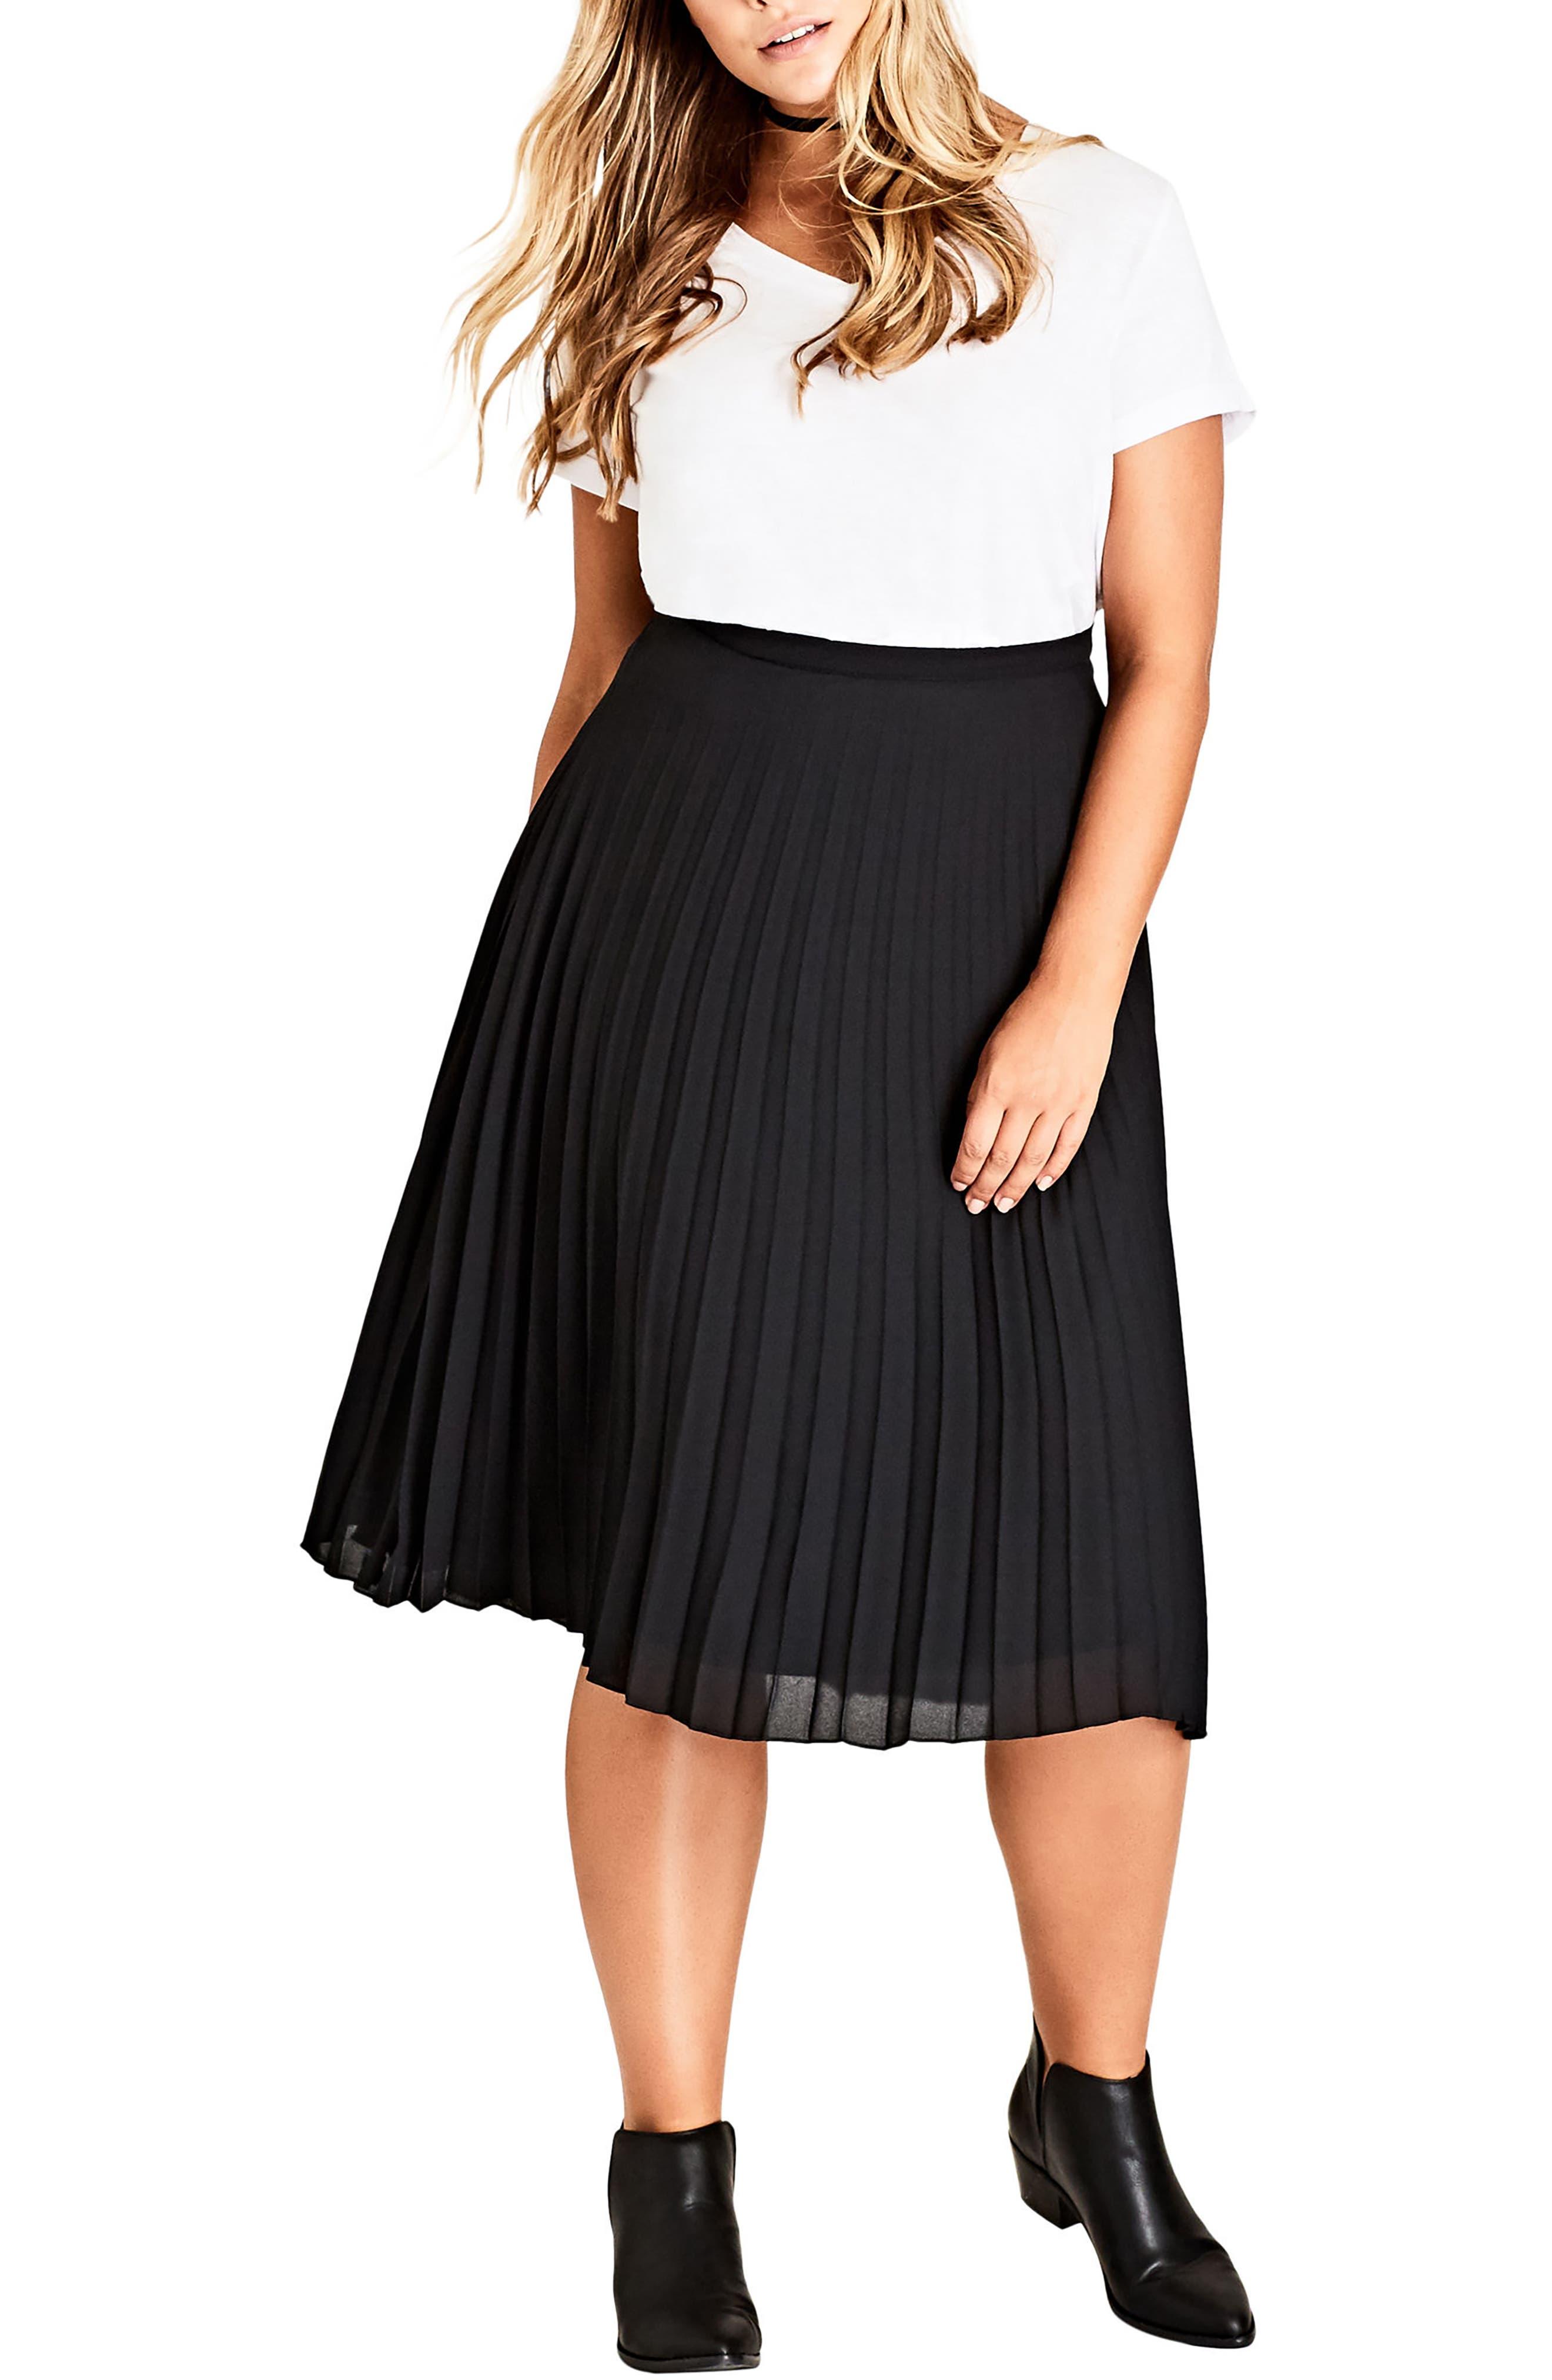 Sheer Pleat Skirt,                             Main thumbnail 1, color,                             001